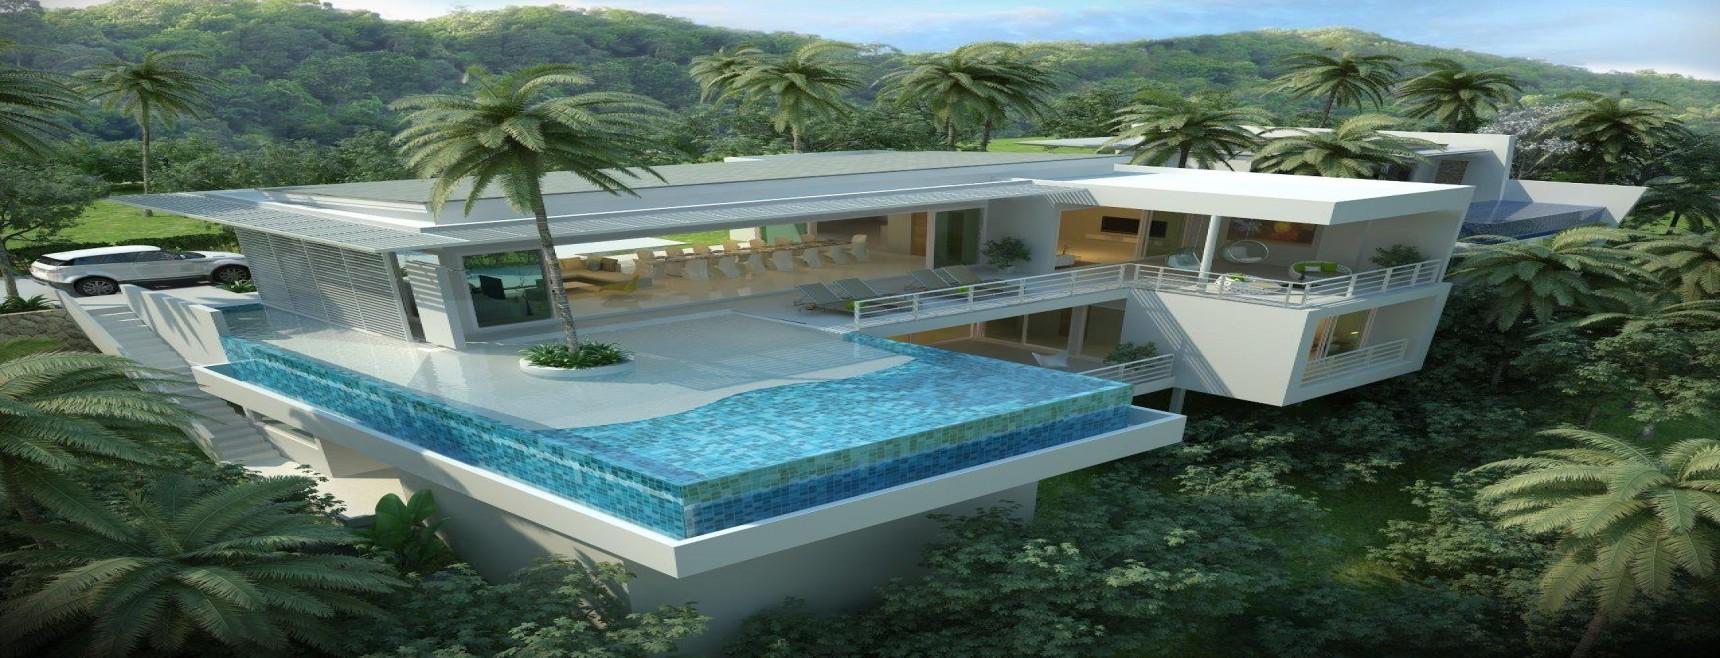 Koh samui, sea view, ocean views, sunset, luxury villa